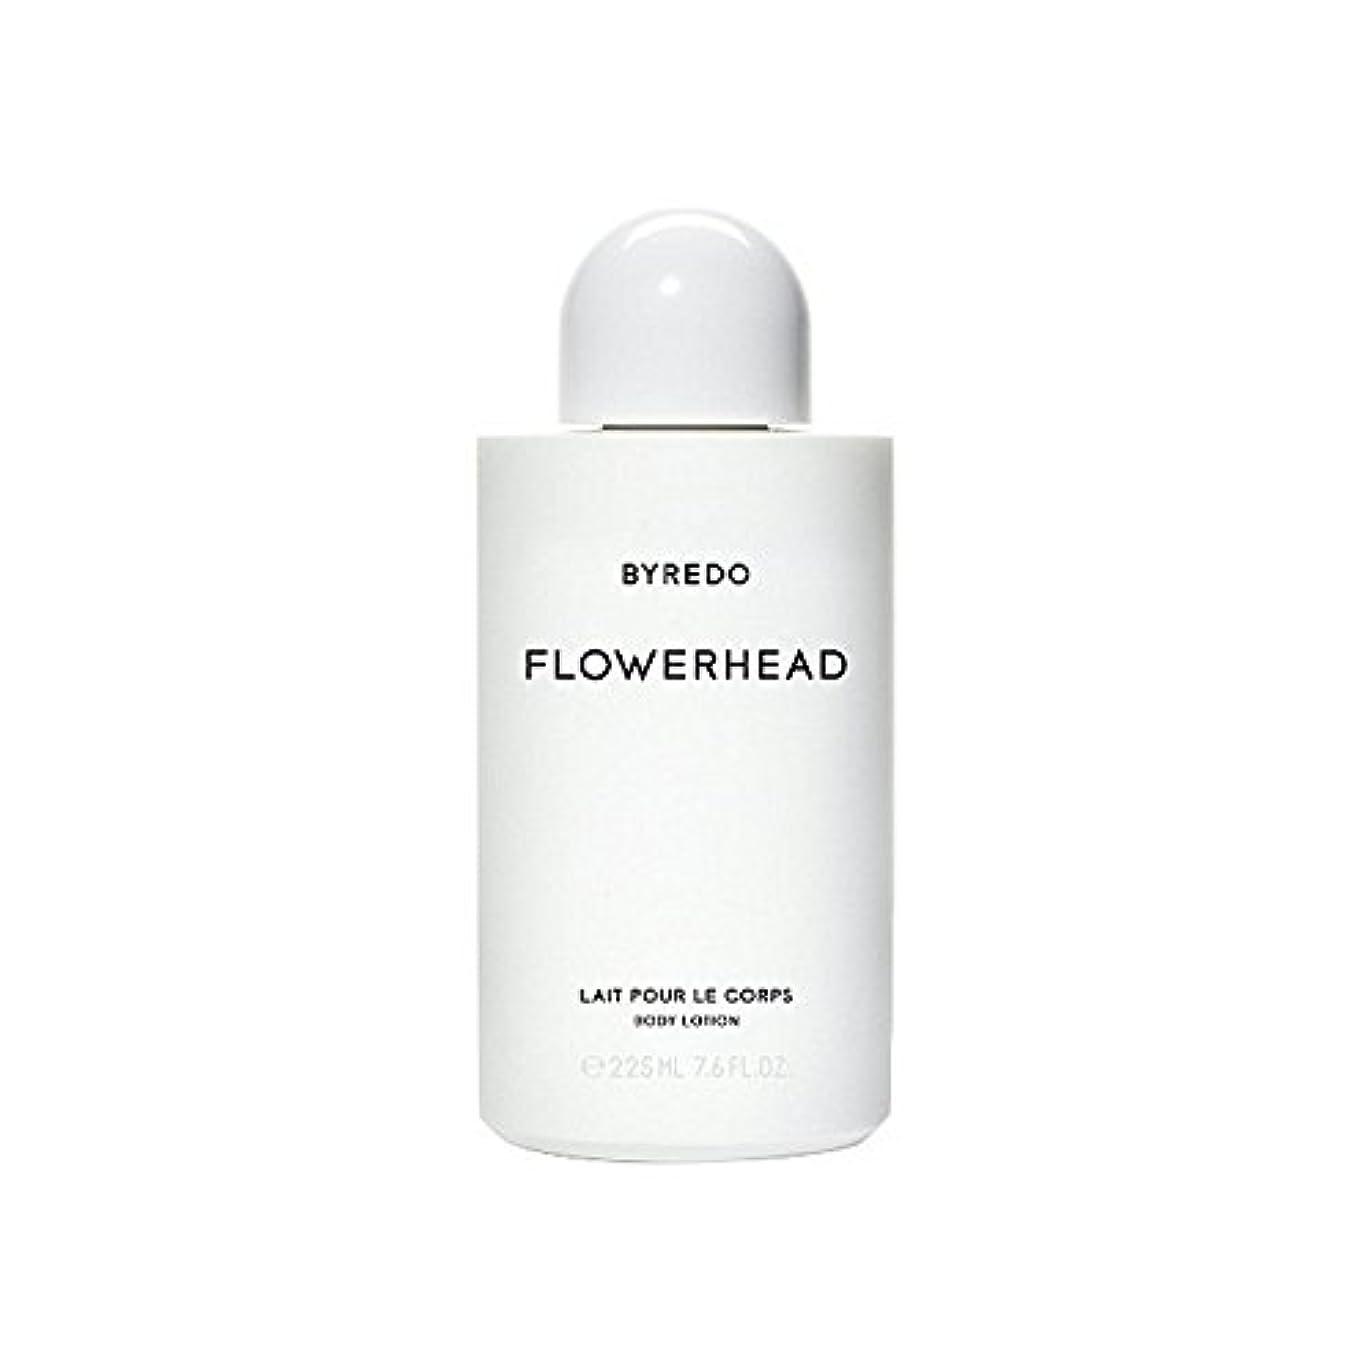 Byredo Flowerhead Body Lotion 225ml (Pack of 6) - ボディローション225ミリリットル x6 [並行輸入品]